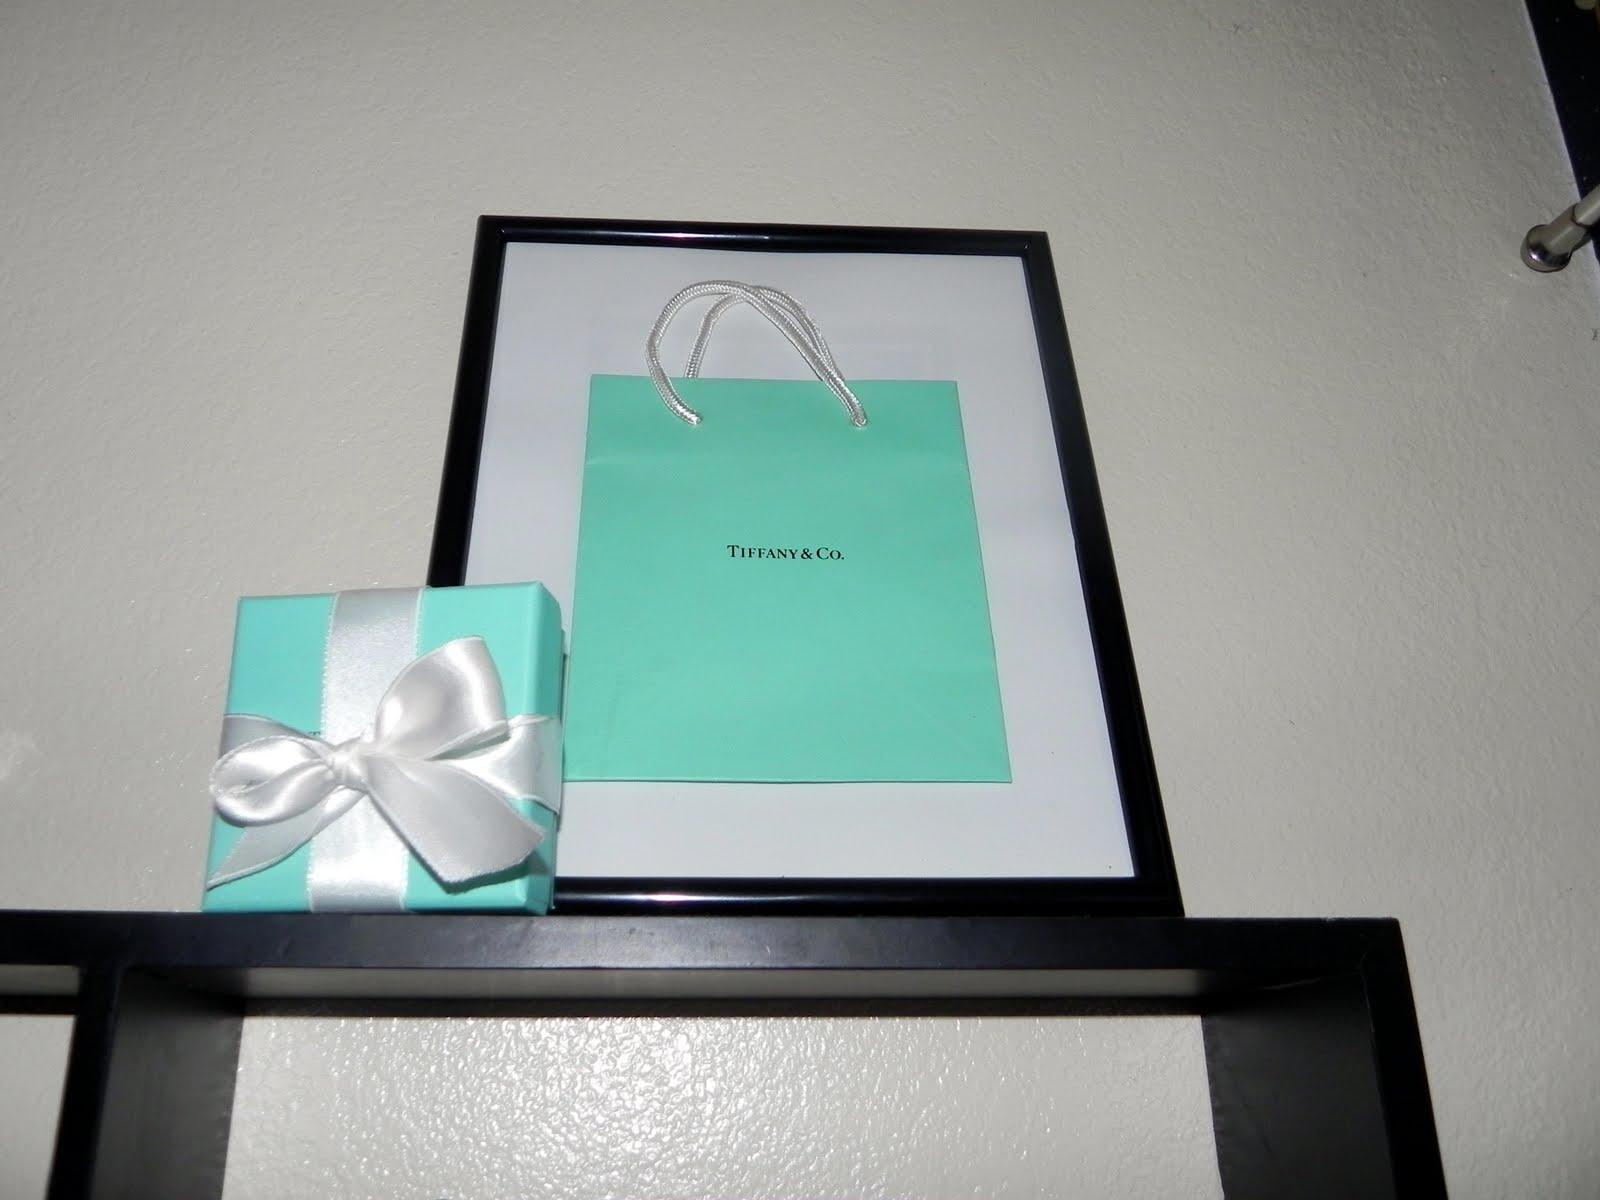 30 Days Of DIY Day 19 Frame Your Tiffanys Bag